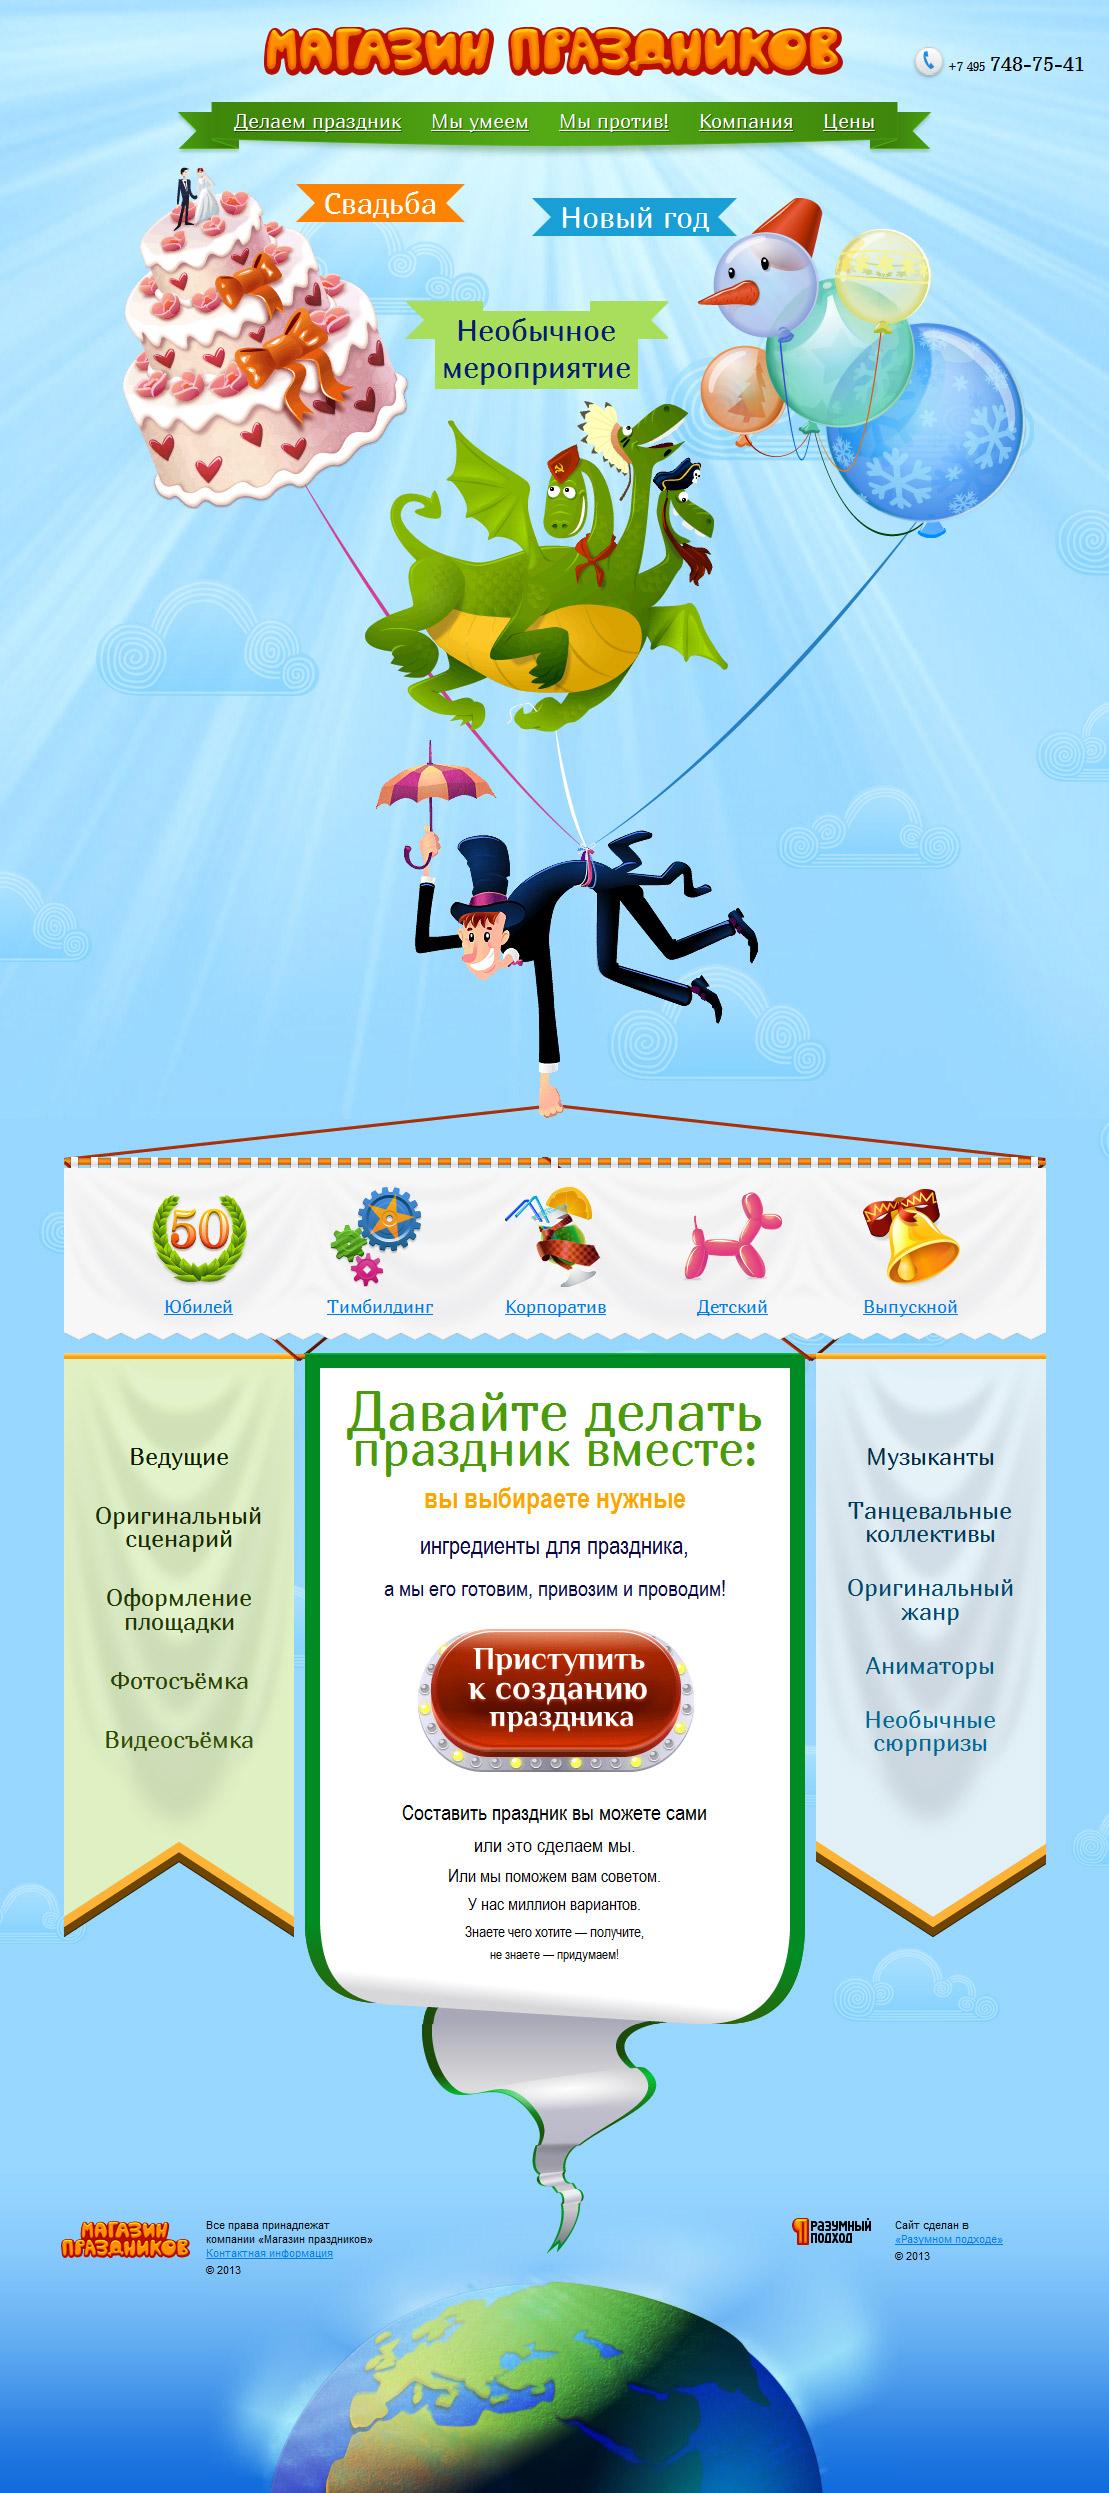 Magazin Prazdnikov web site